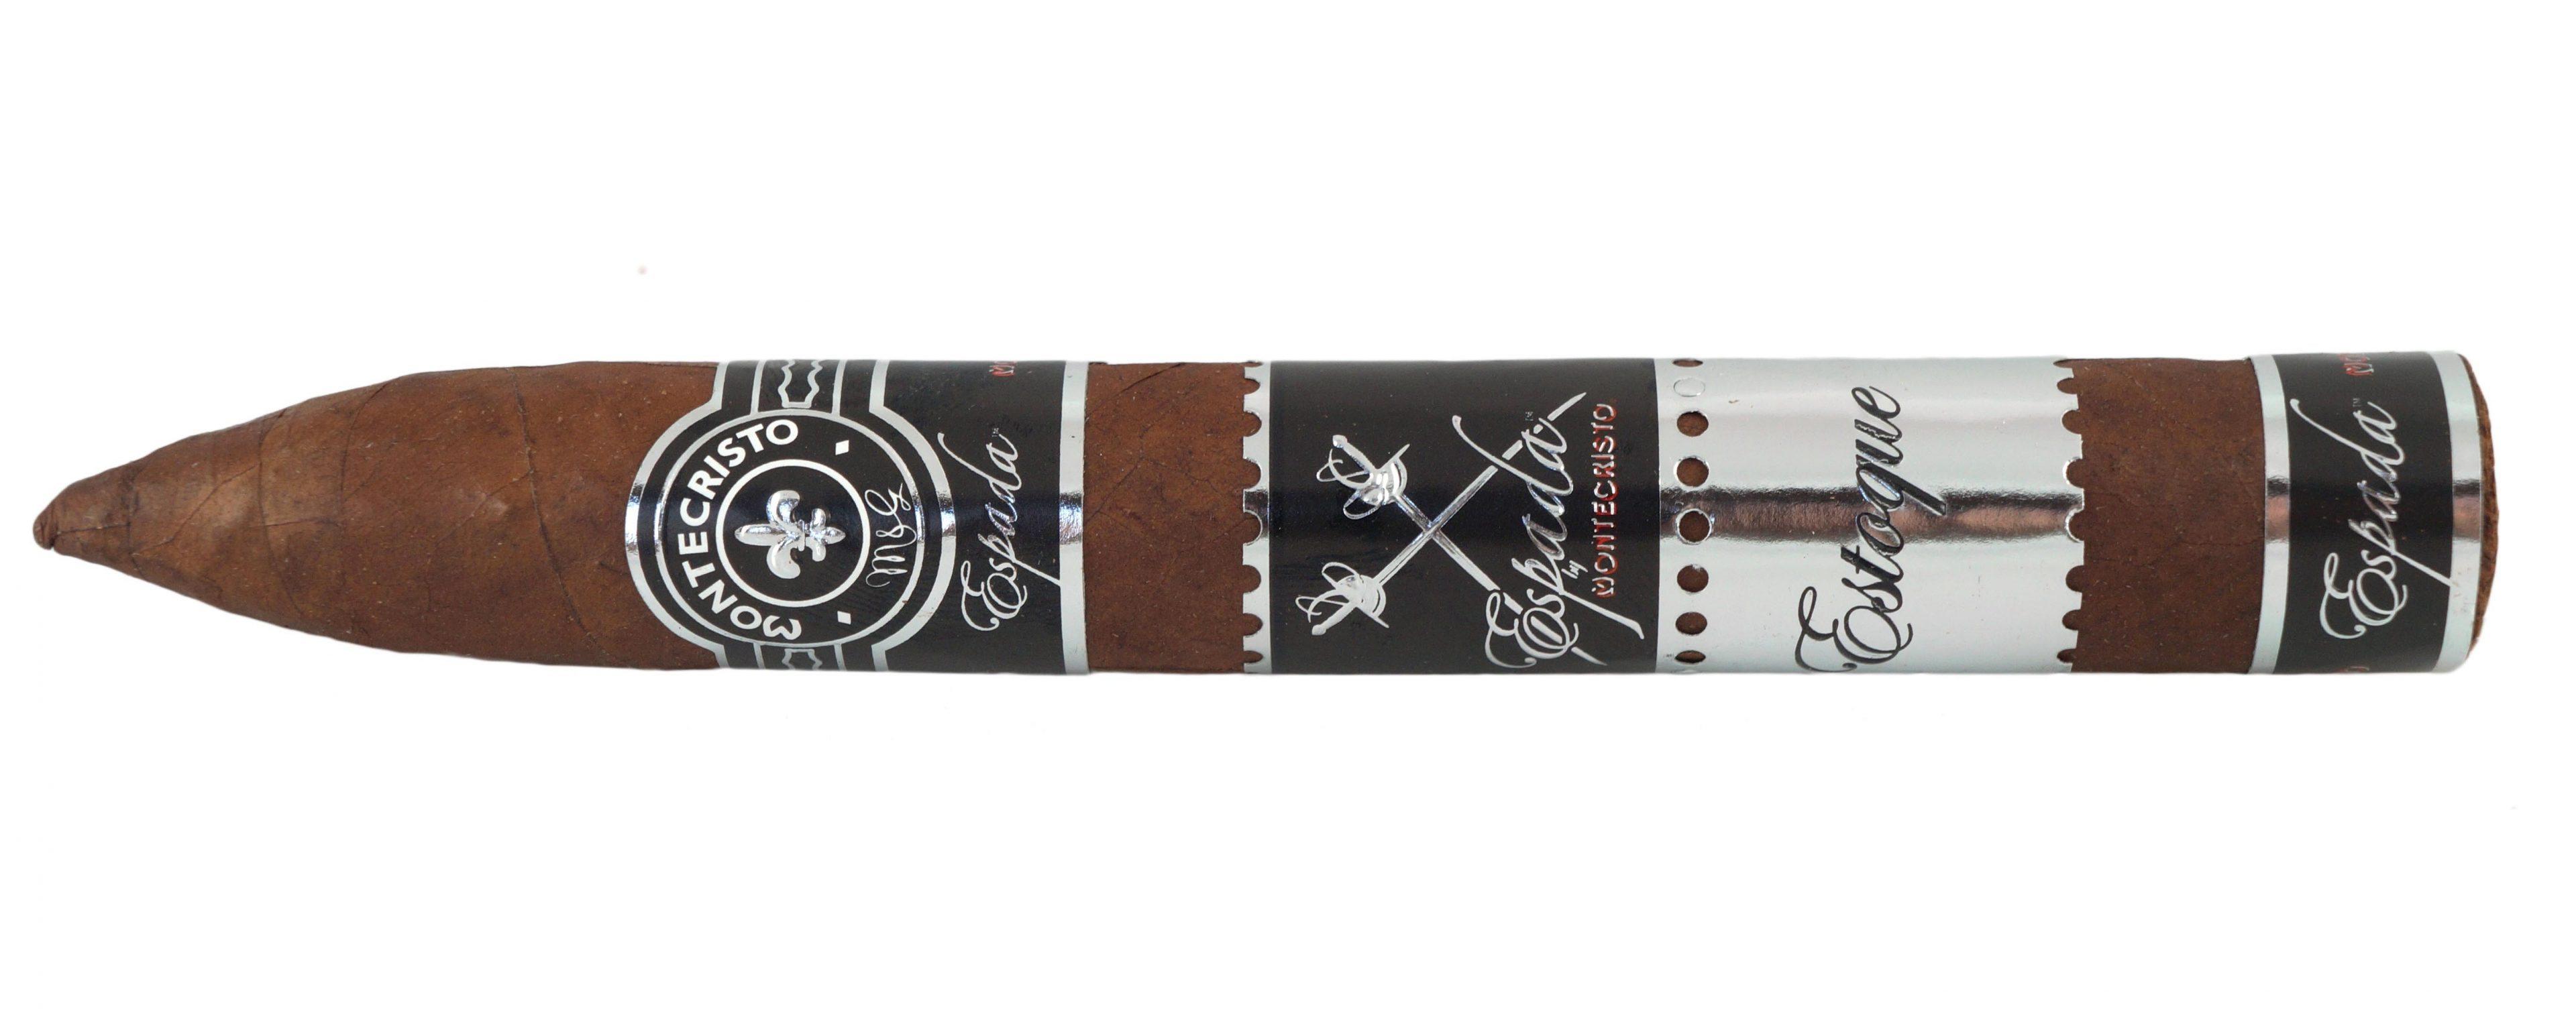 Blind Cigar Review: Montecristo | Espada Estoque